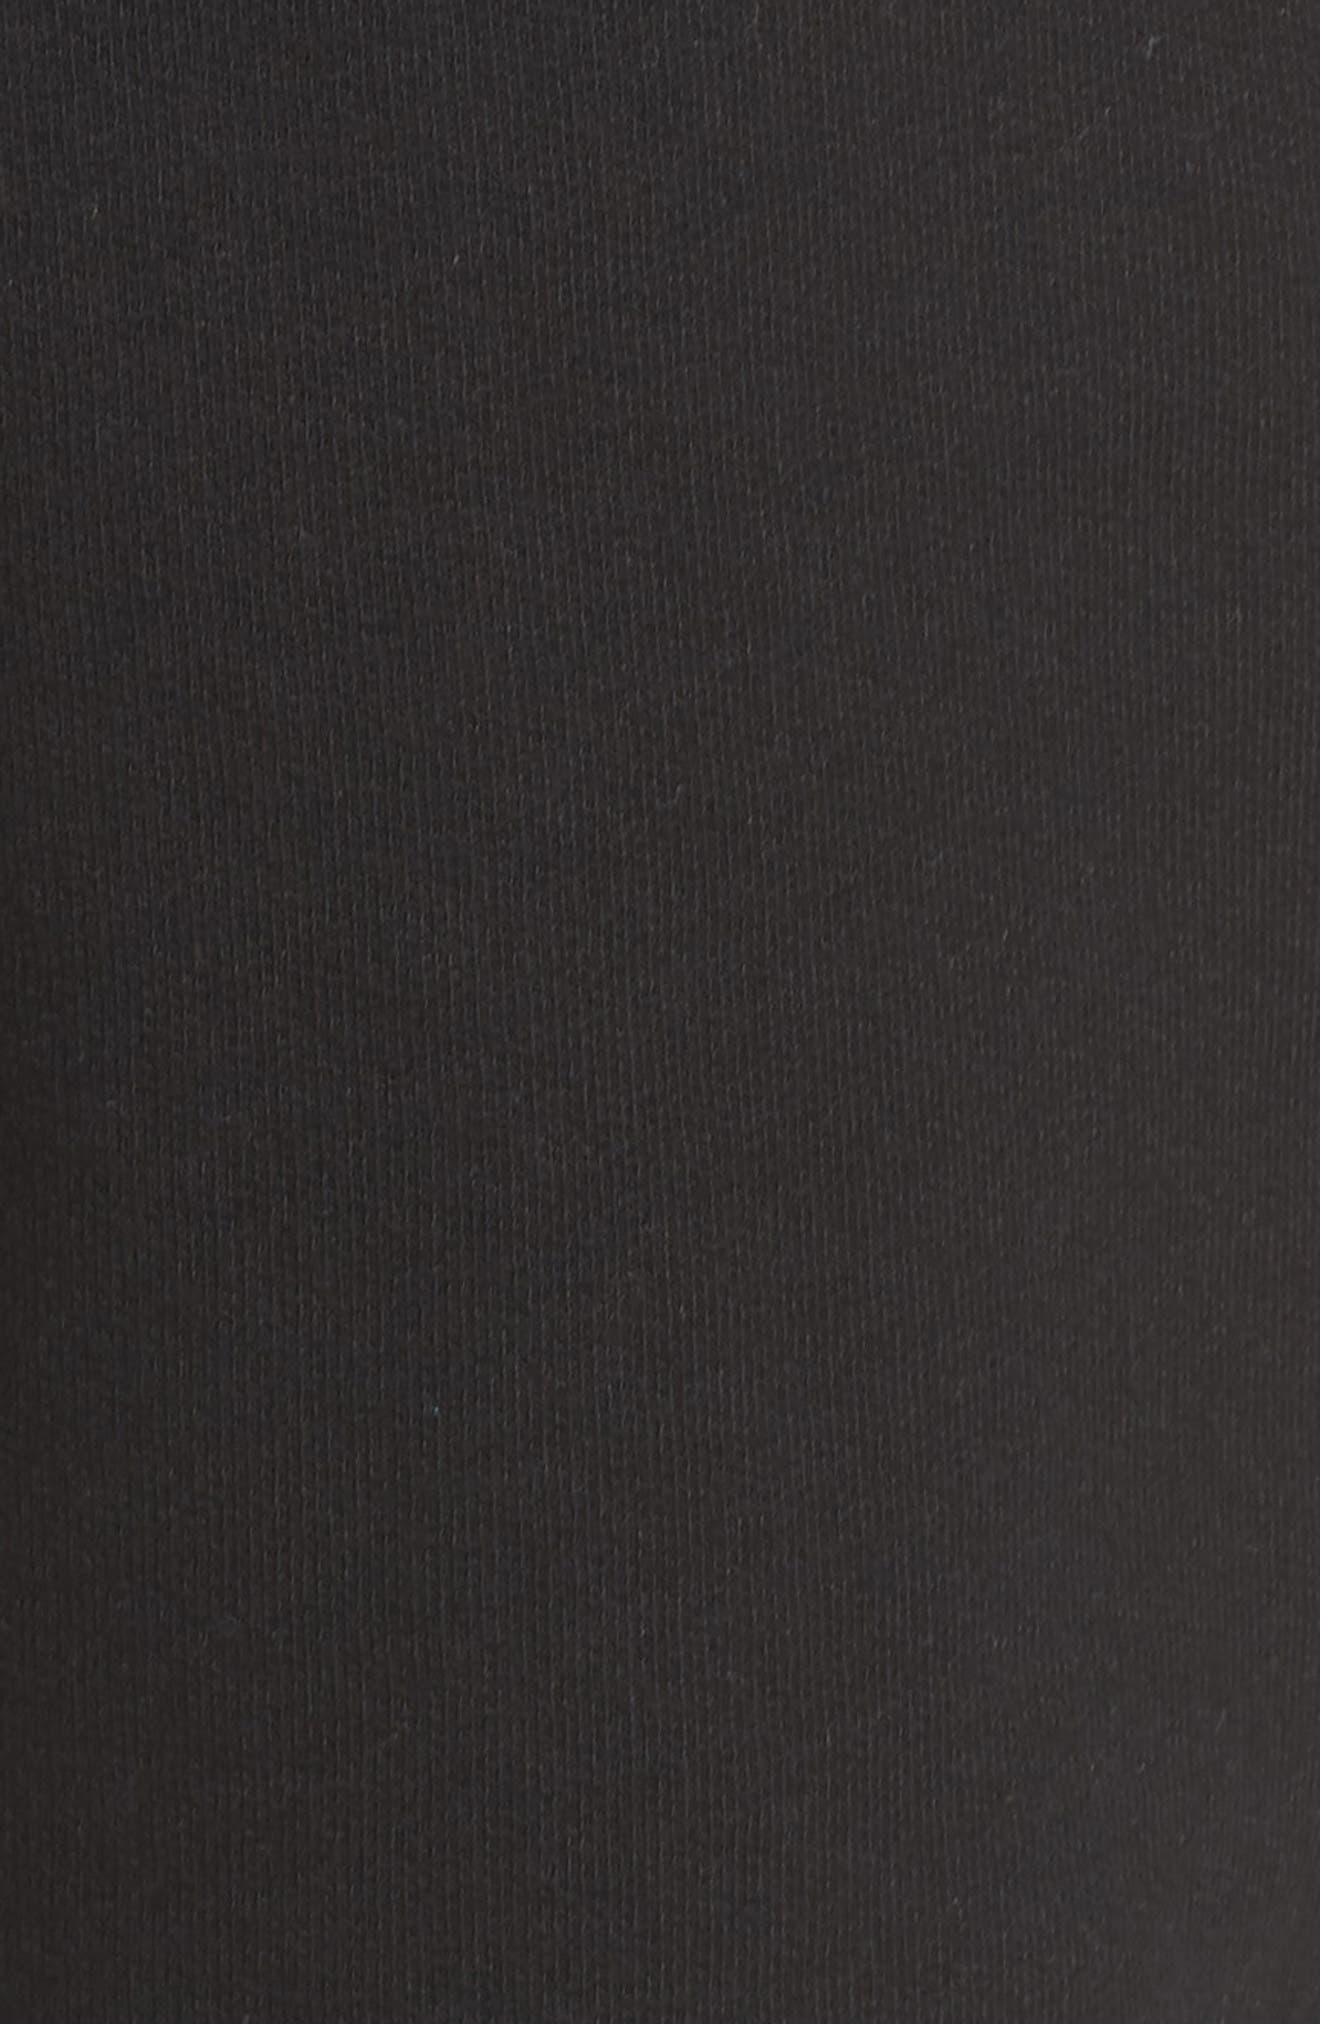 Blonde Lounge Shorts,                             Alternate thumbnail 6, color,                             Black